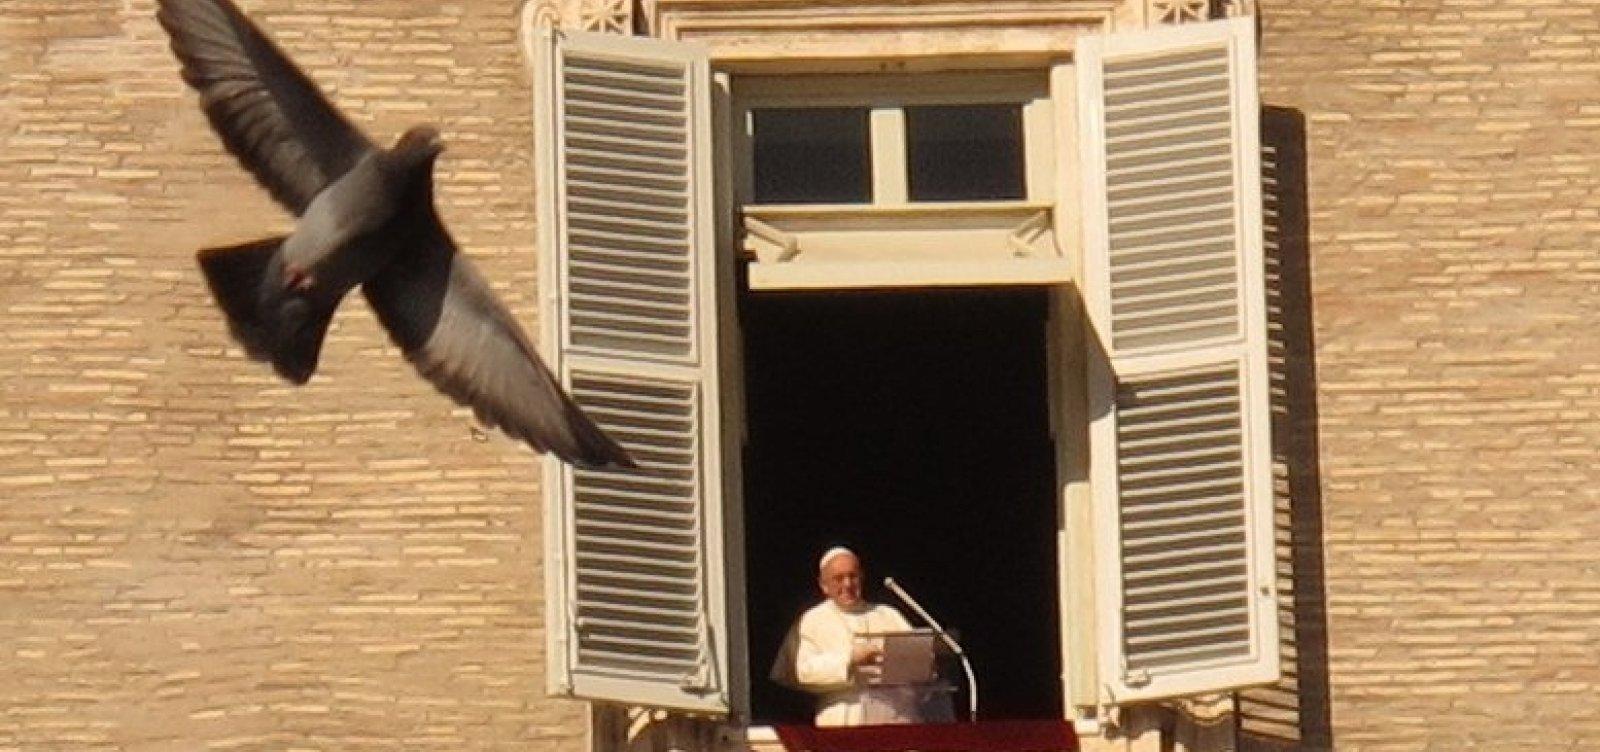 Papa Francisco anuncia que receberá vacina contra Covid-19 na próxima semana e critica negacionistas